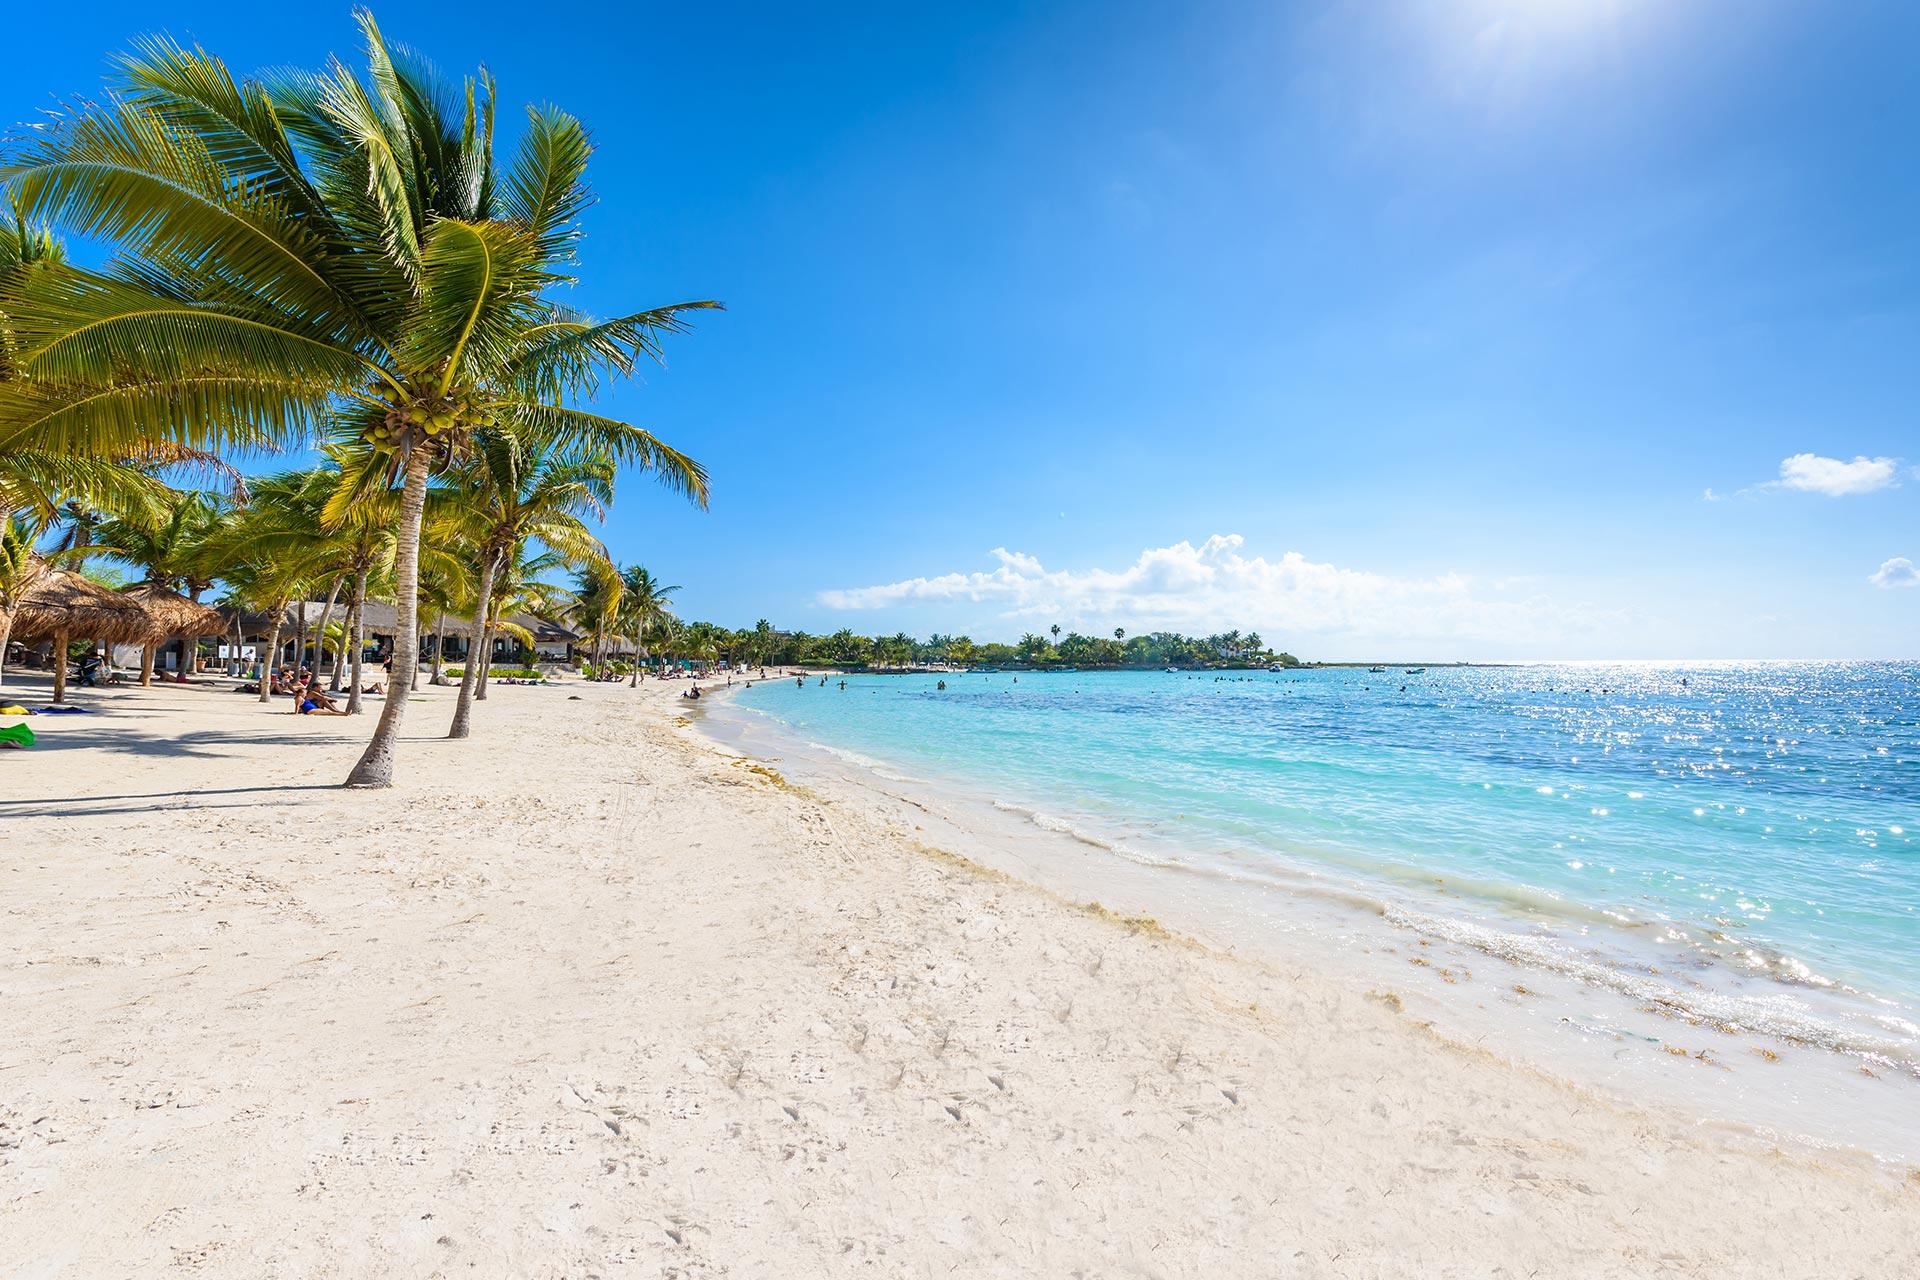 Sejur plaja Bahia Principe Resort, Riviera Maya, Mexic, 9 zile - ianuarie 2022